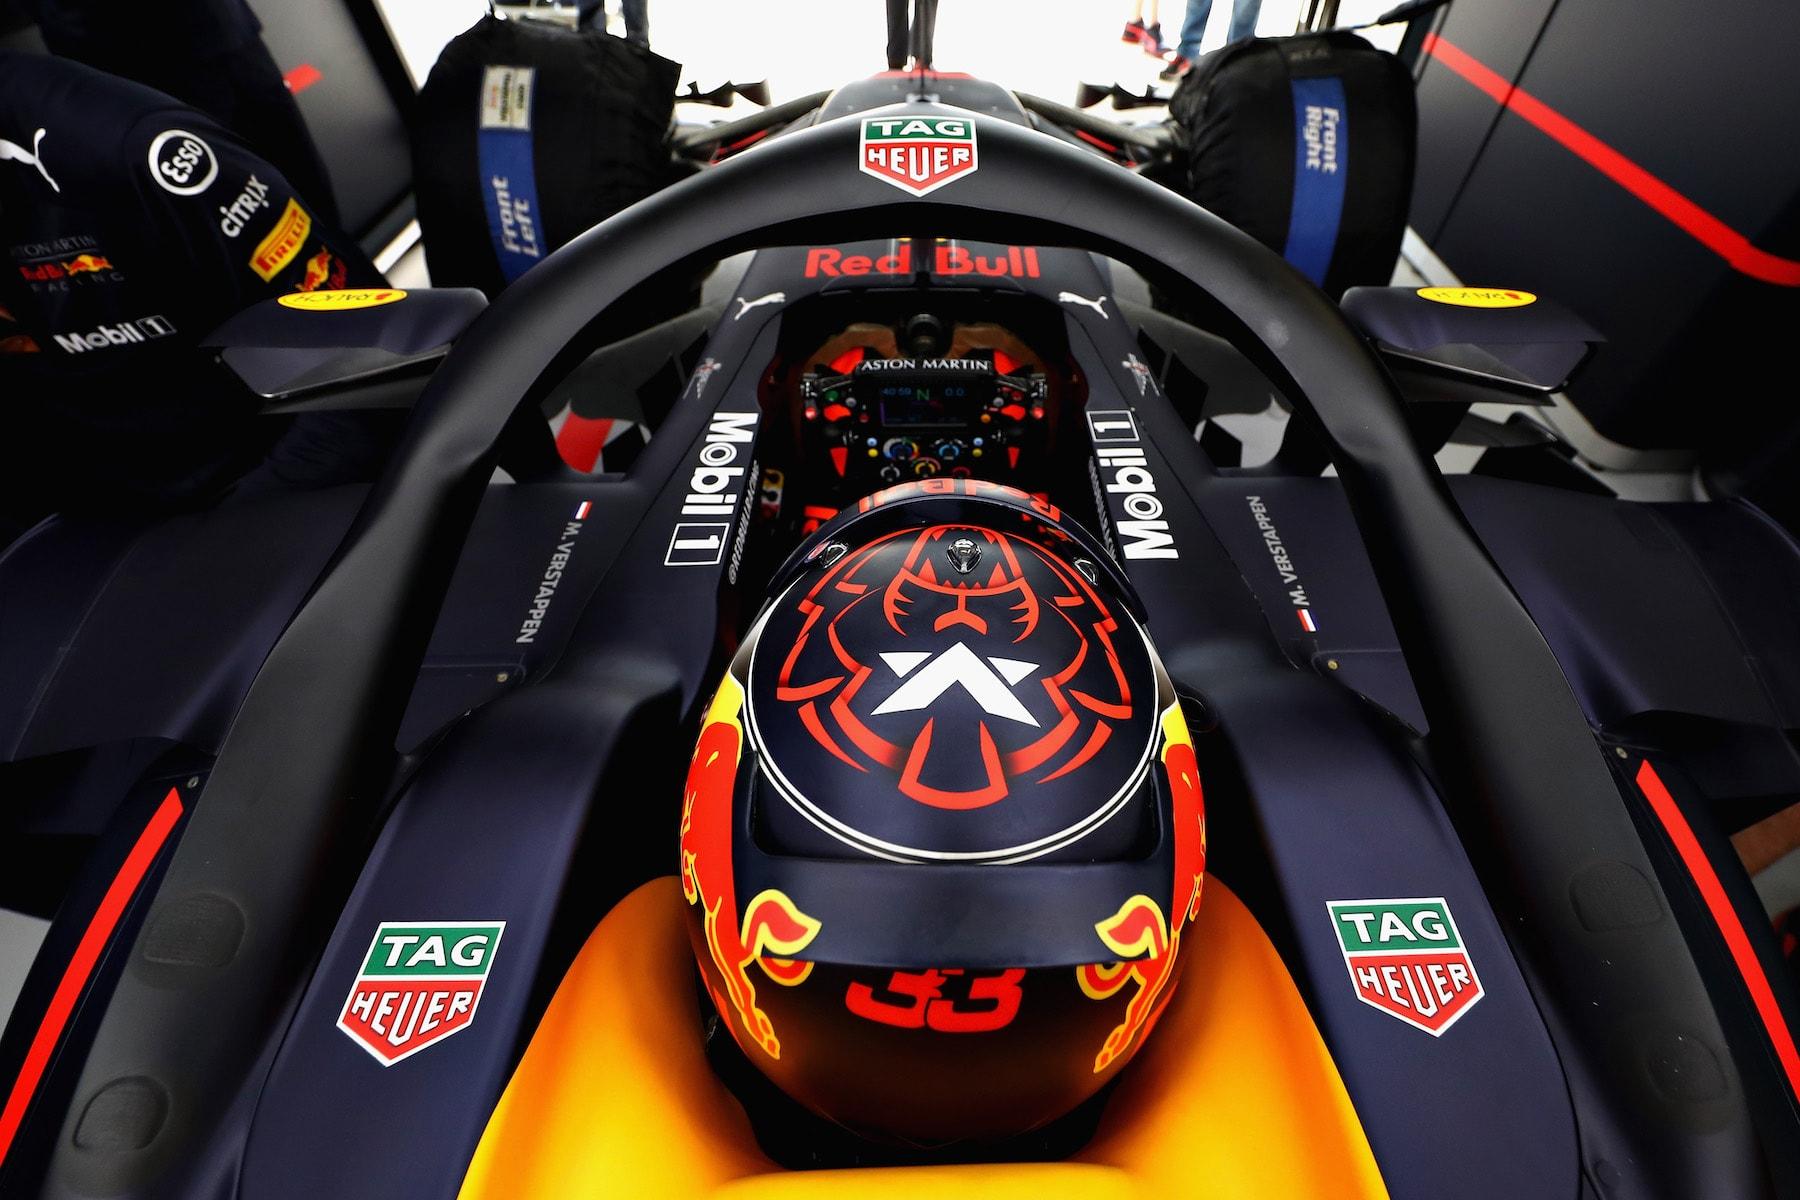 2018 Max Verstappen | Red Bull RB14 | 2018 Russian GP 1 Photo by Mark Thompson copy.jpg